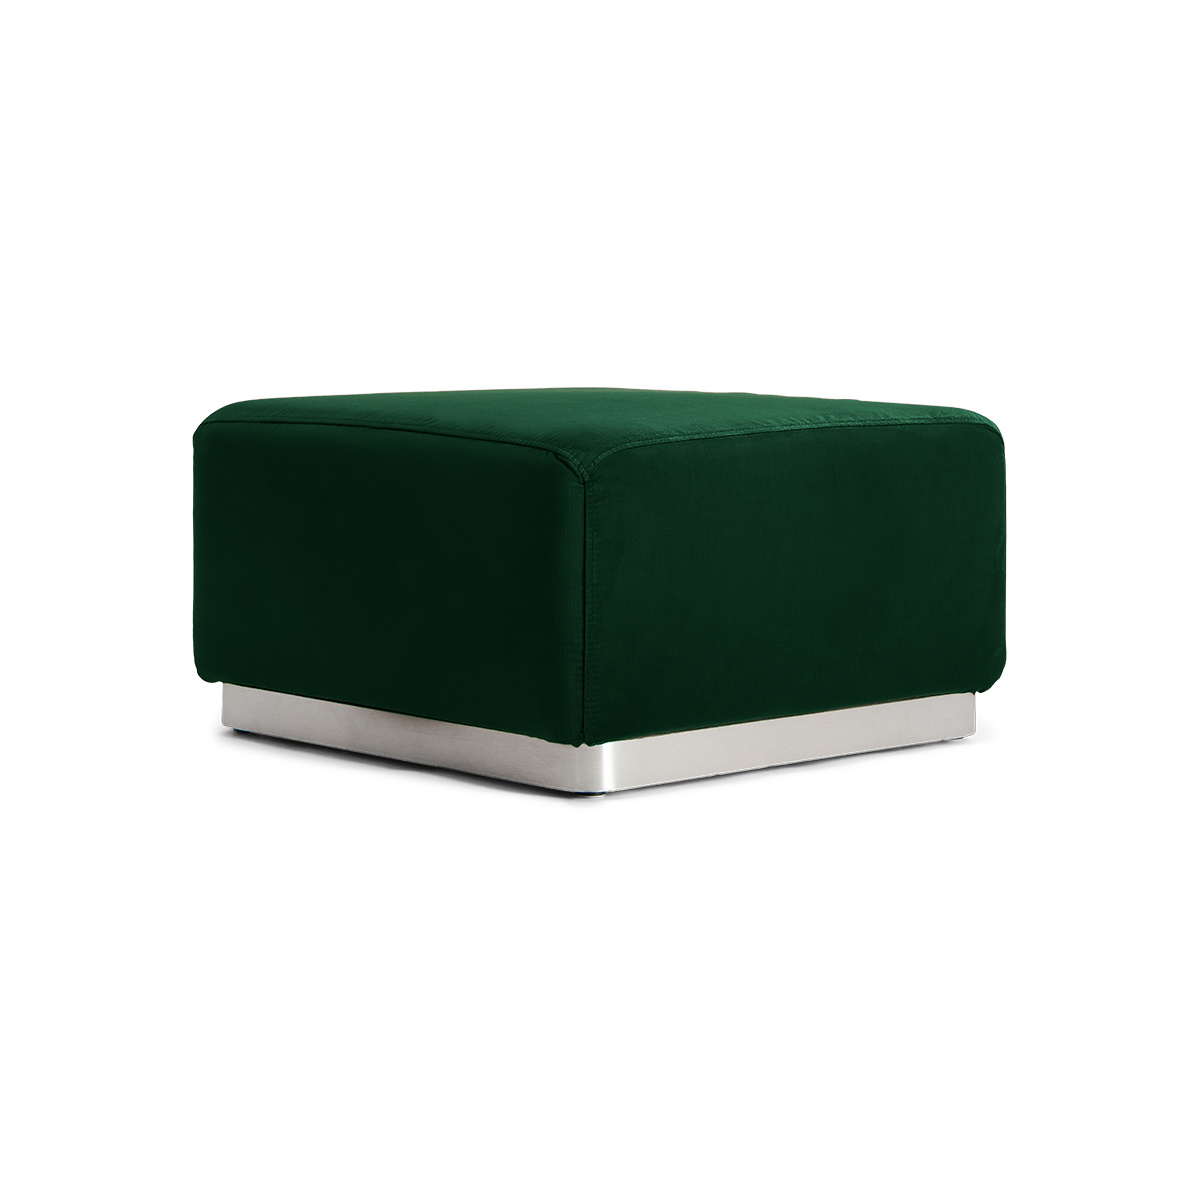 Rotondo Footstool in Fir Green Velvet